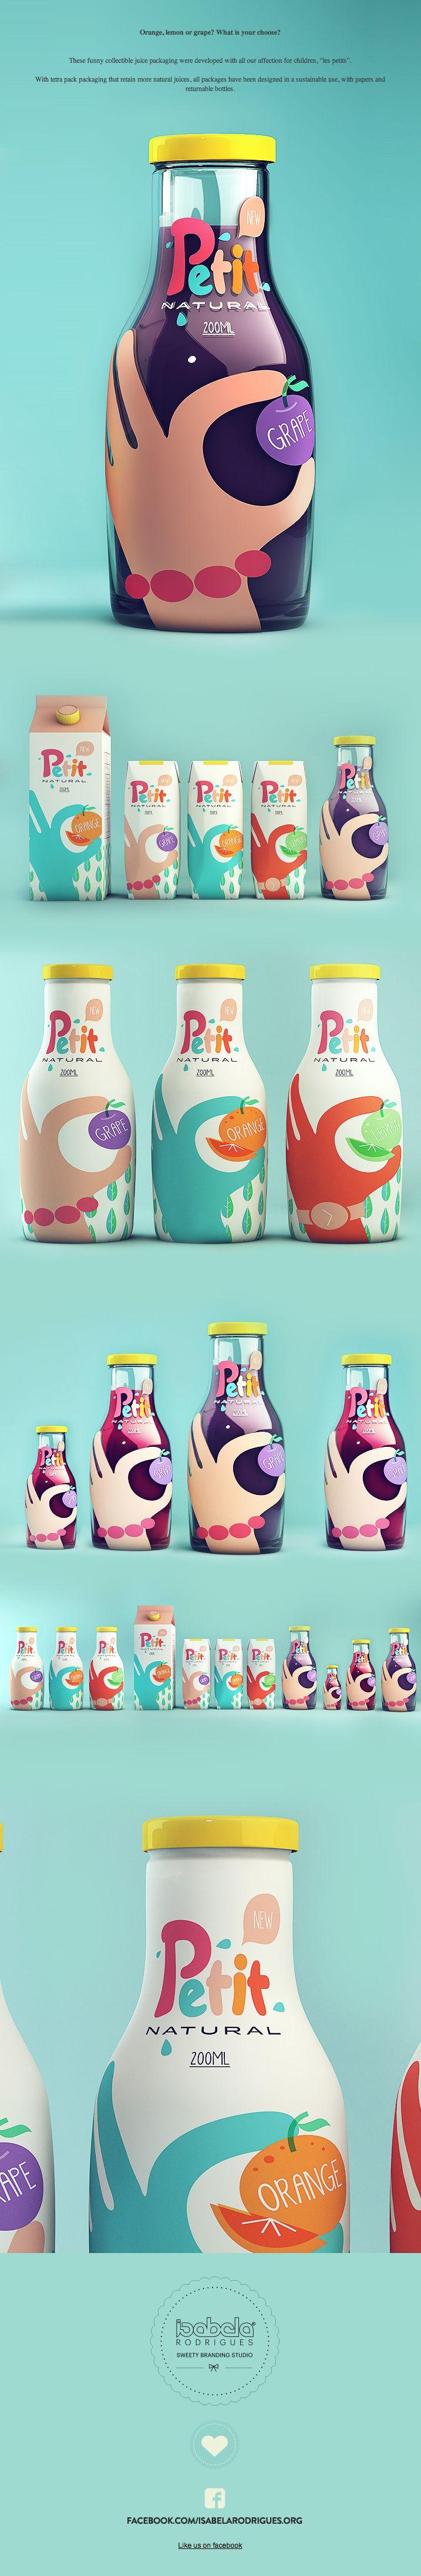 Petit - Natural Juice by Isabela Rodrigues, via Behance ***  #package #behance